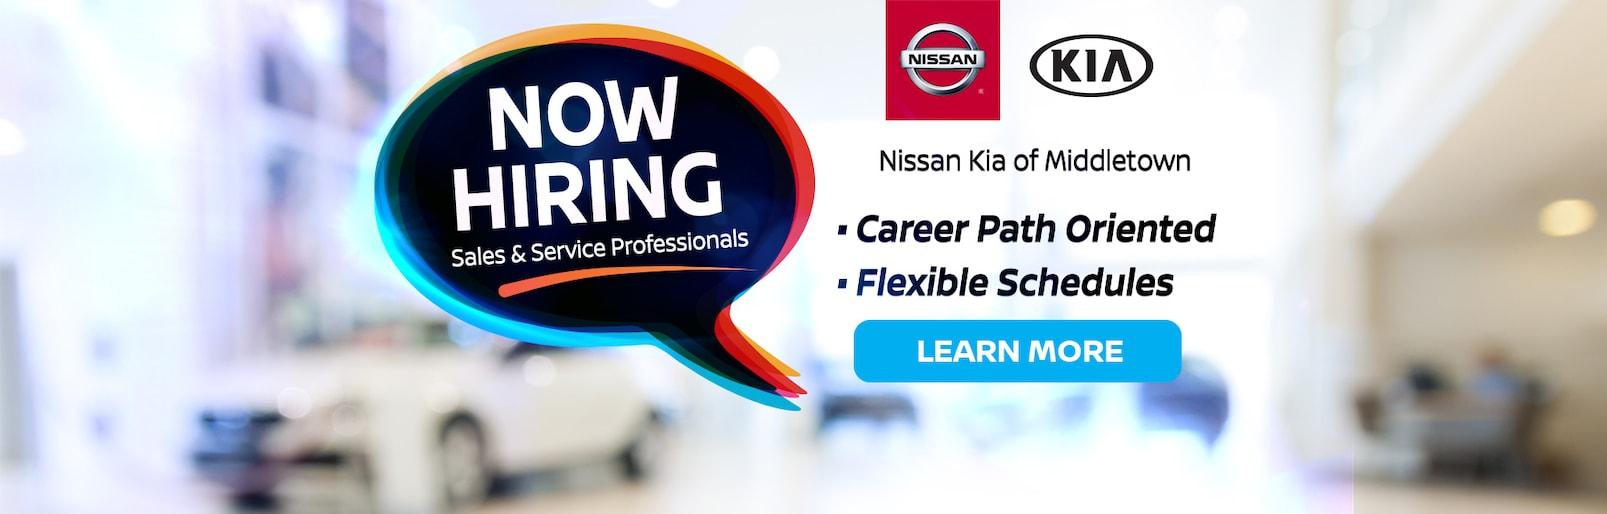 Nissan kia of middletown new kia nissan dealership in new